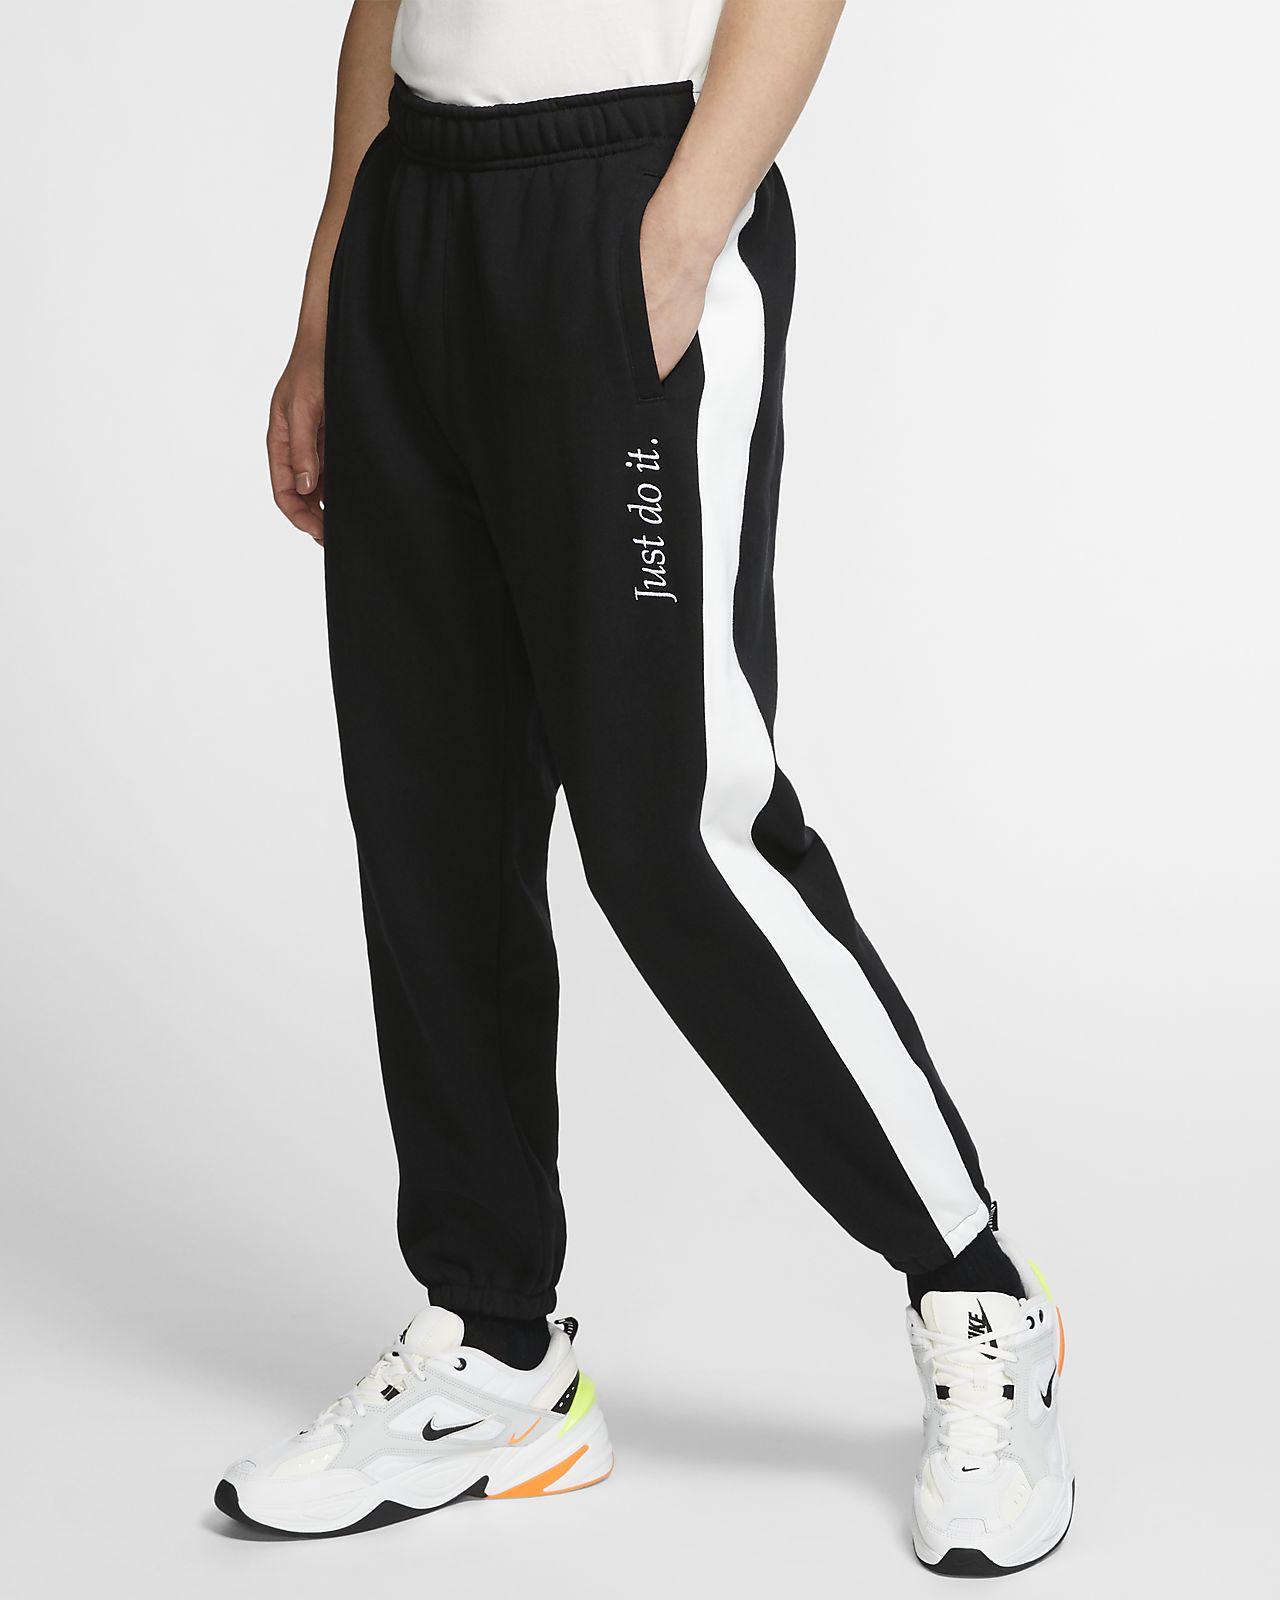 nike pantalon sportswear homme